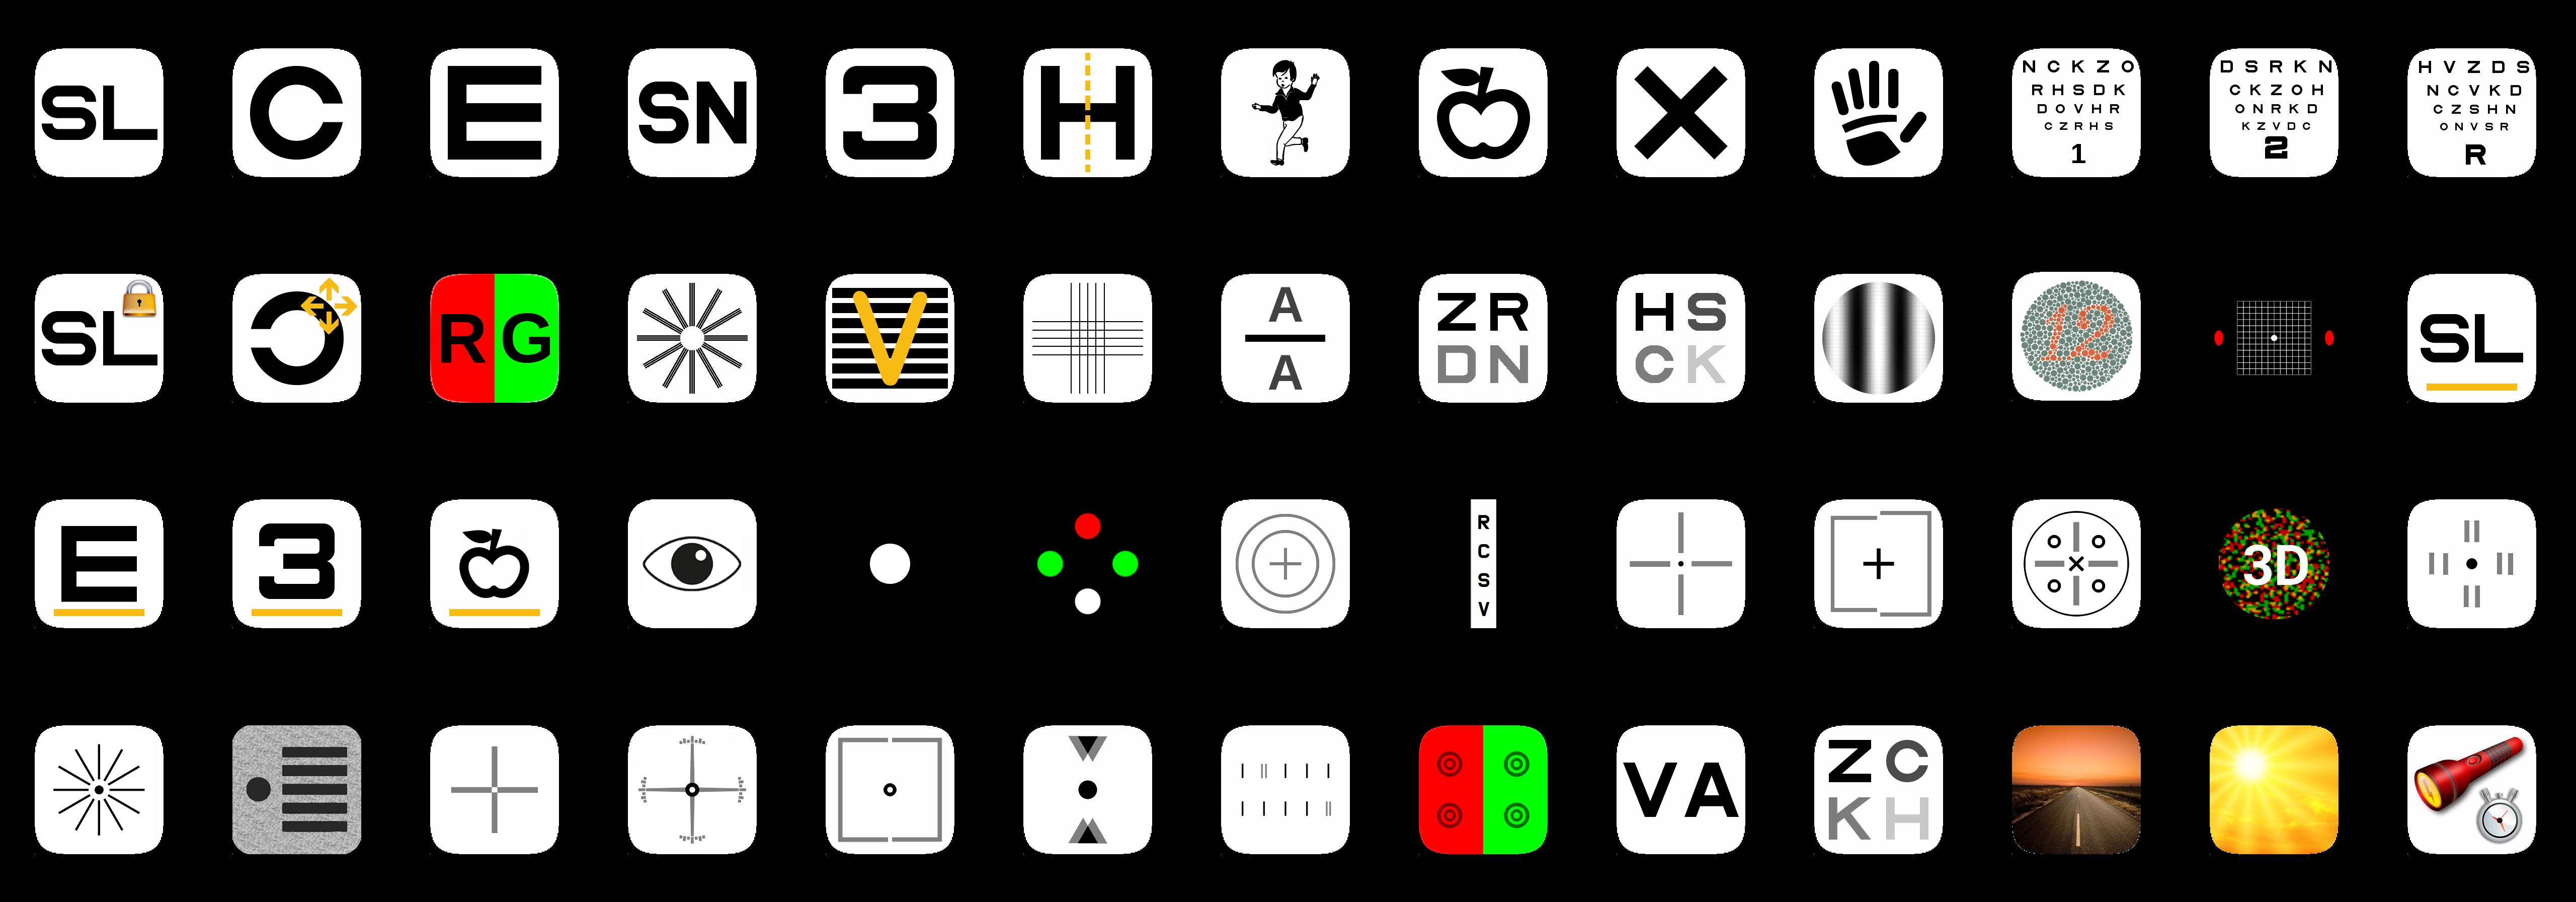 C903P vision chart tests